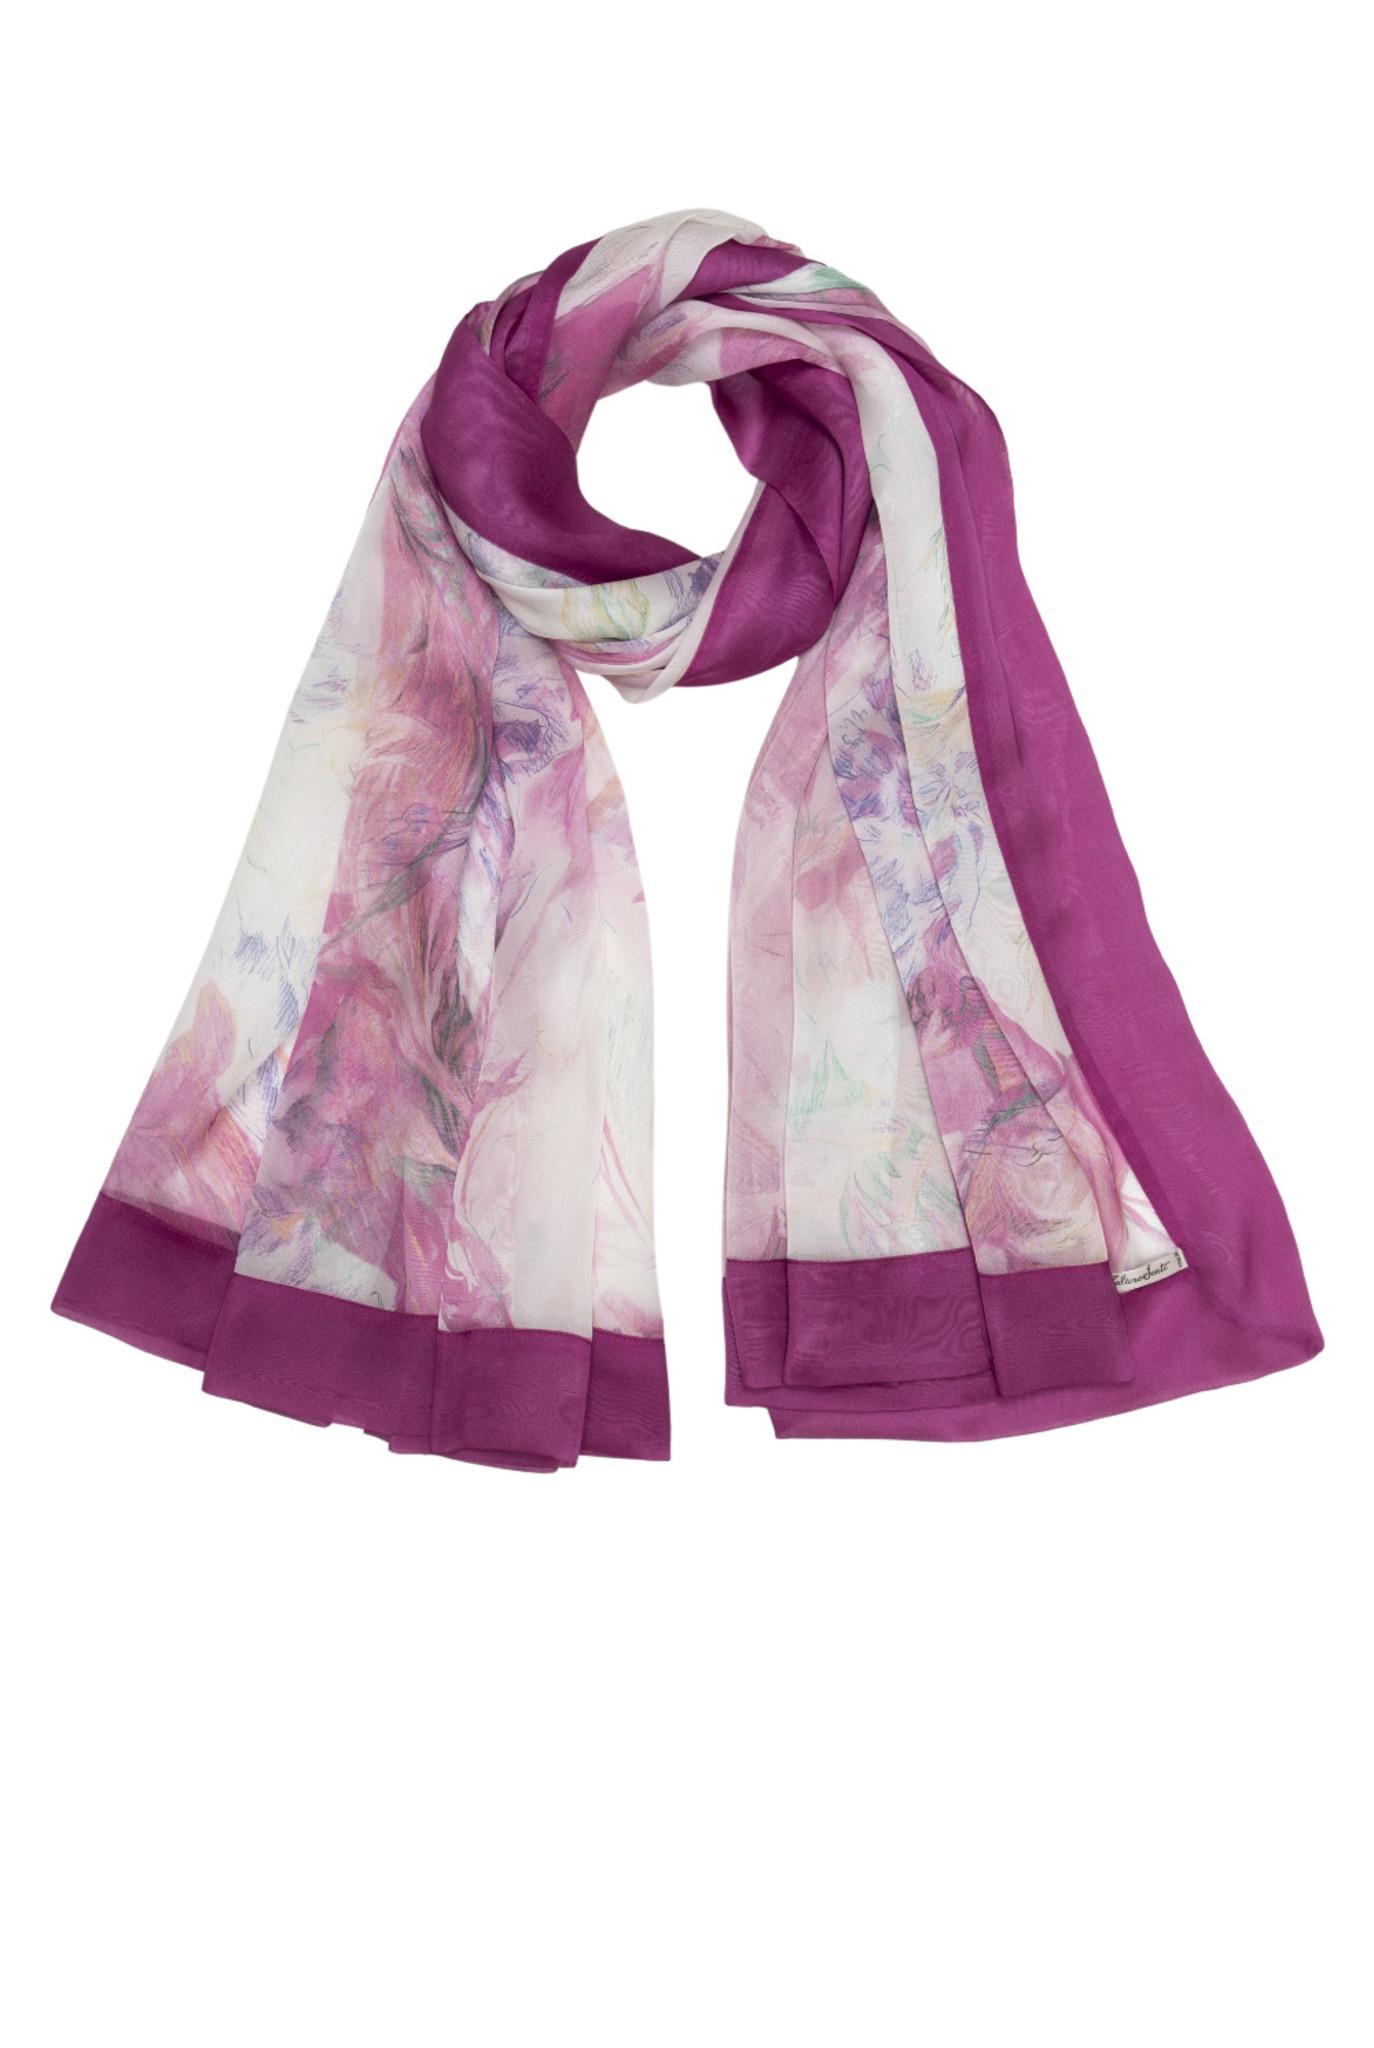 Veronica scarf